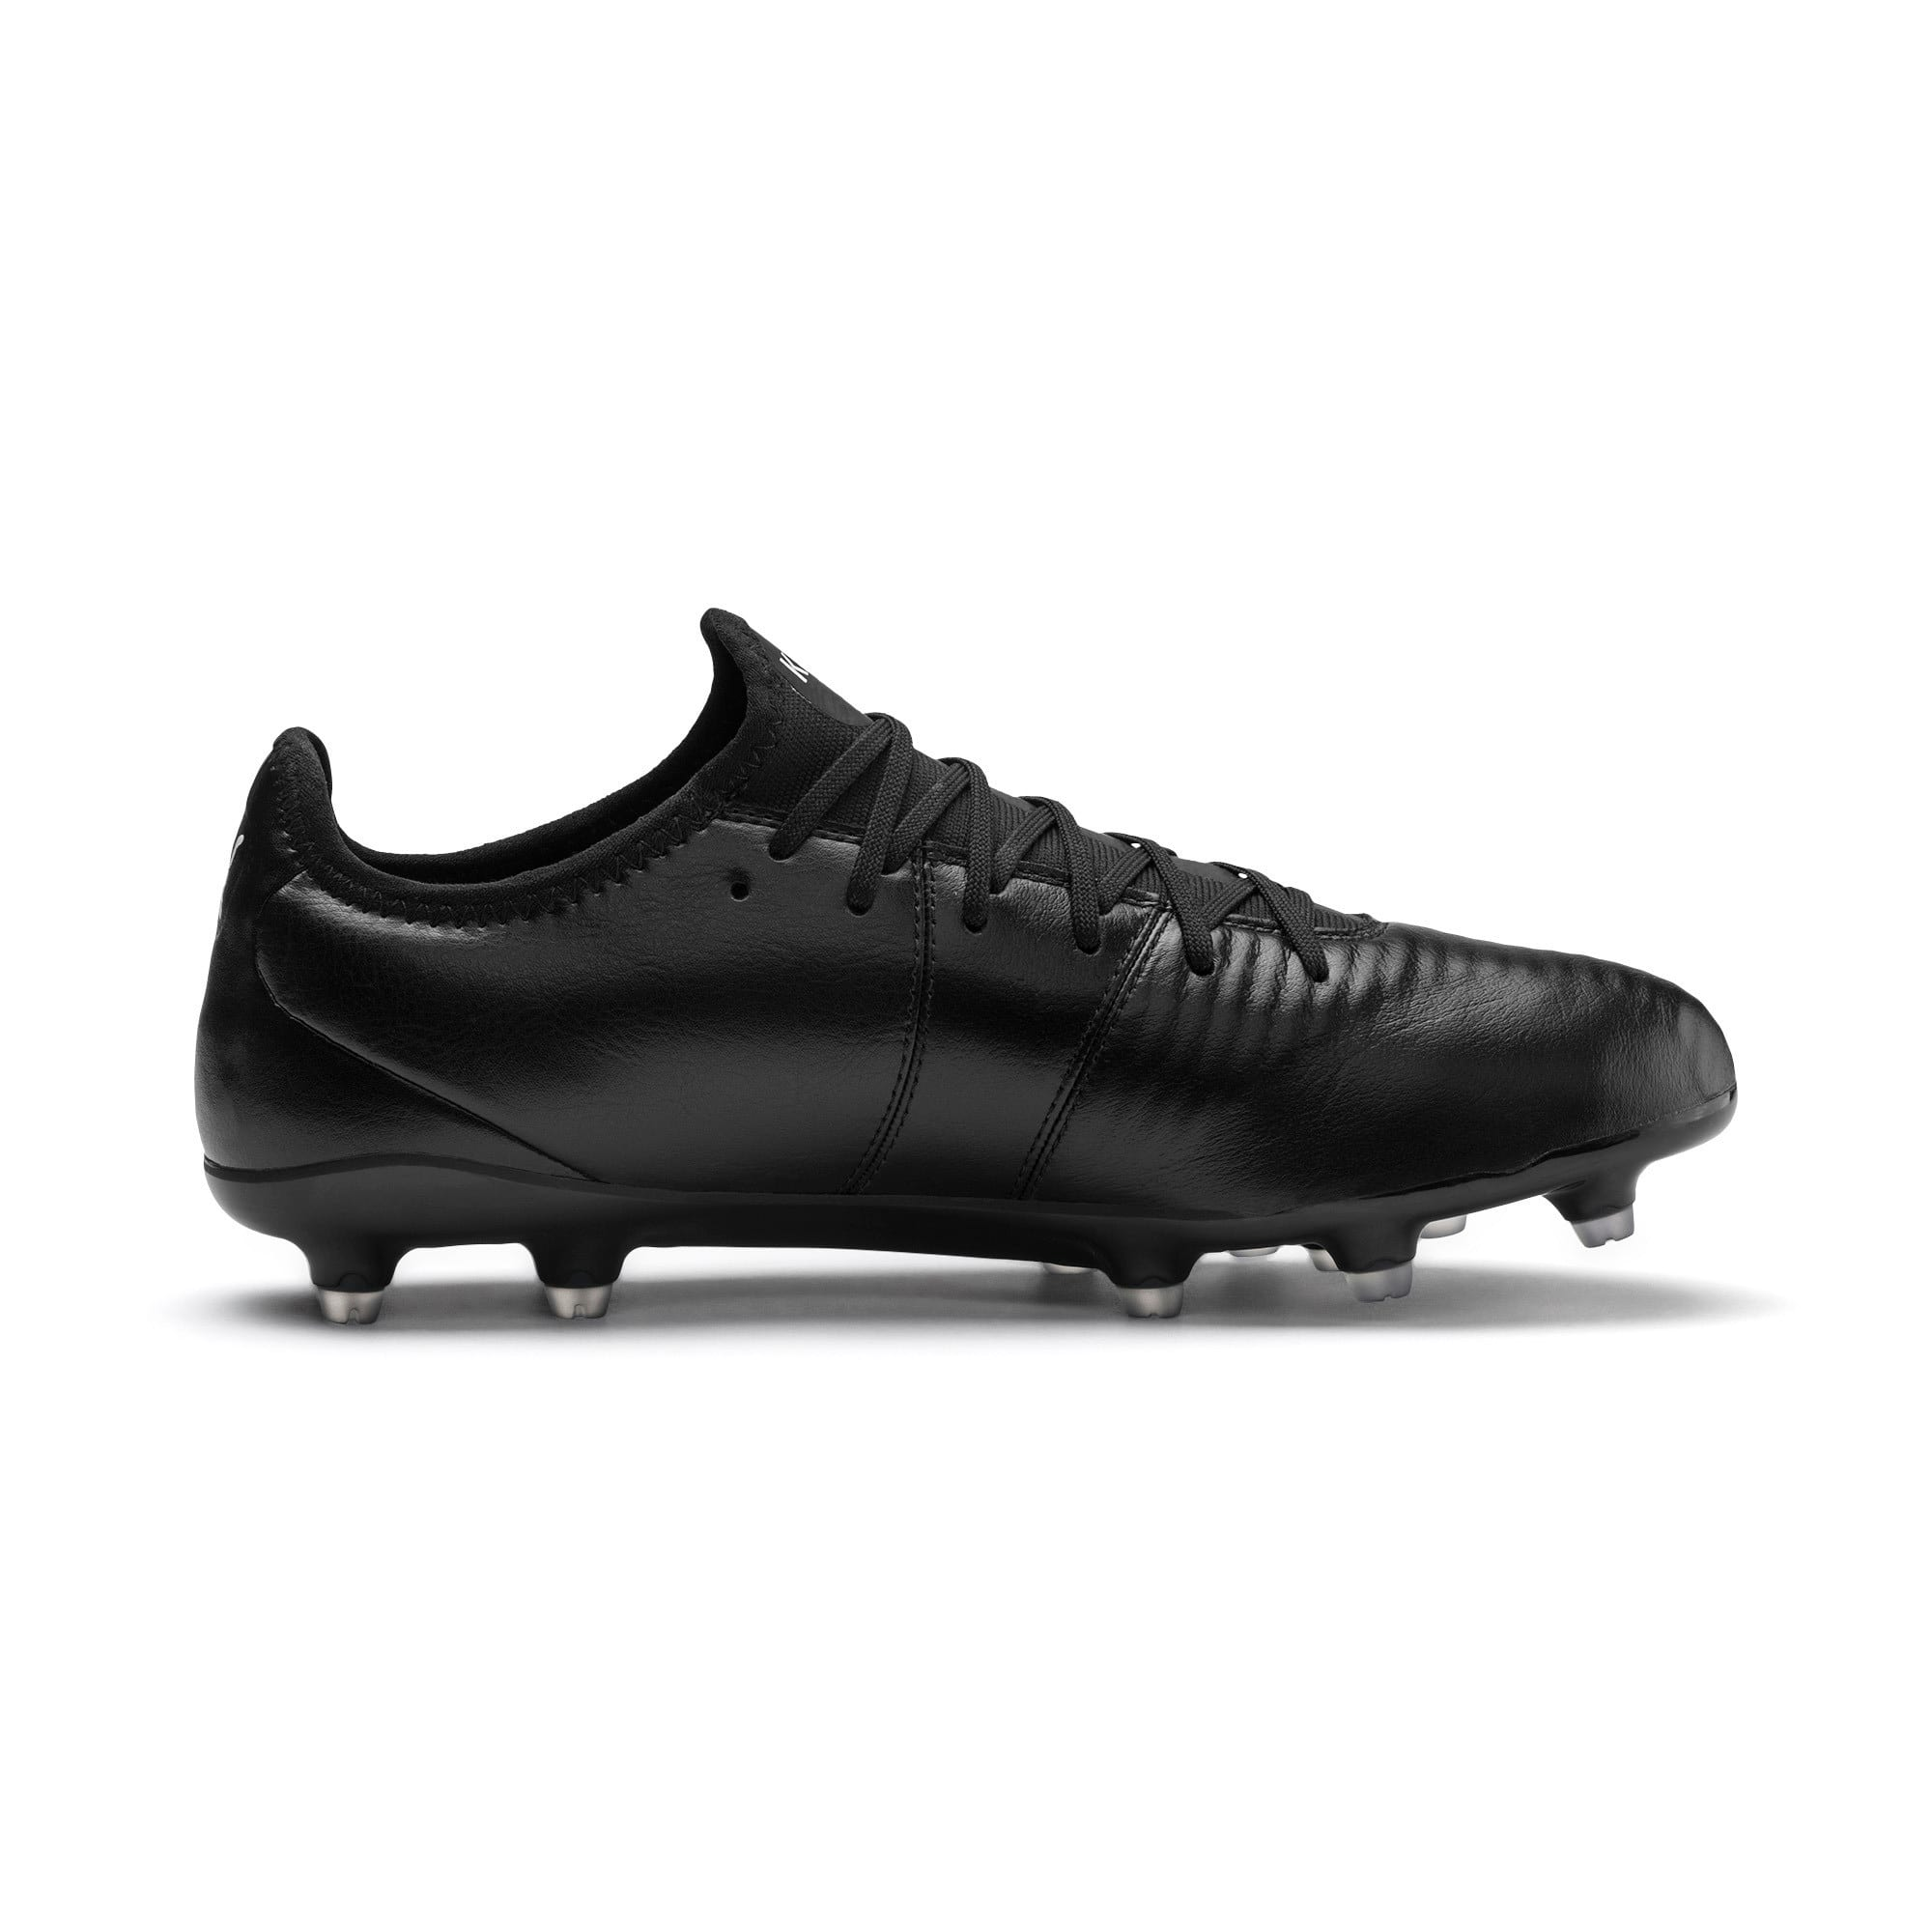 Thumbnail 6 of King Pro FG Soccer Cleats, Puma Black-Puma White, medium